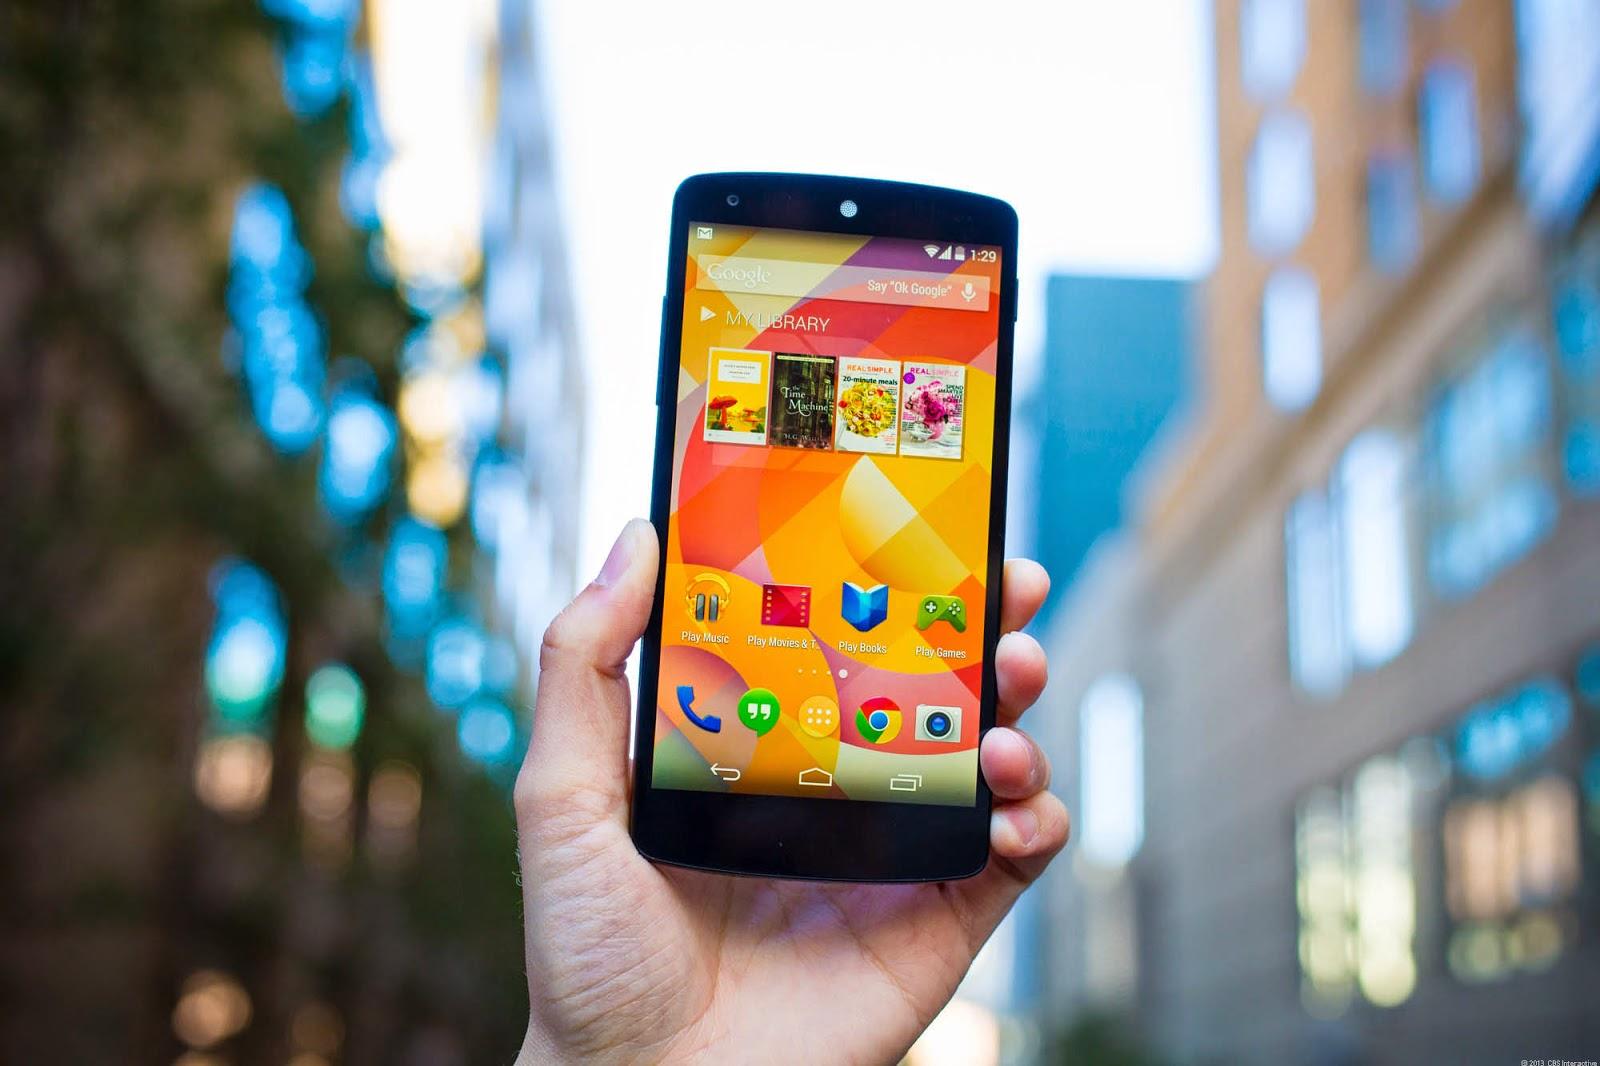 Google's LG Nexus 5